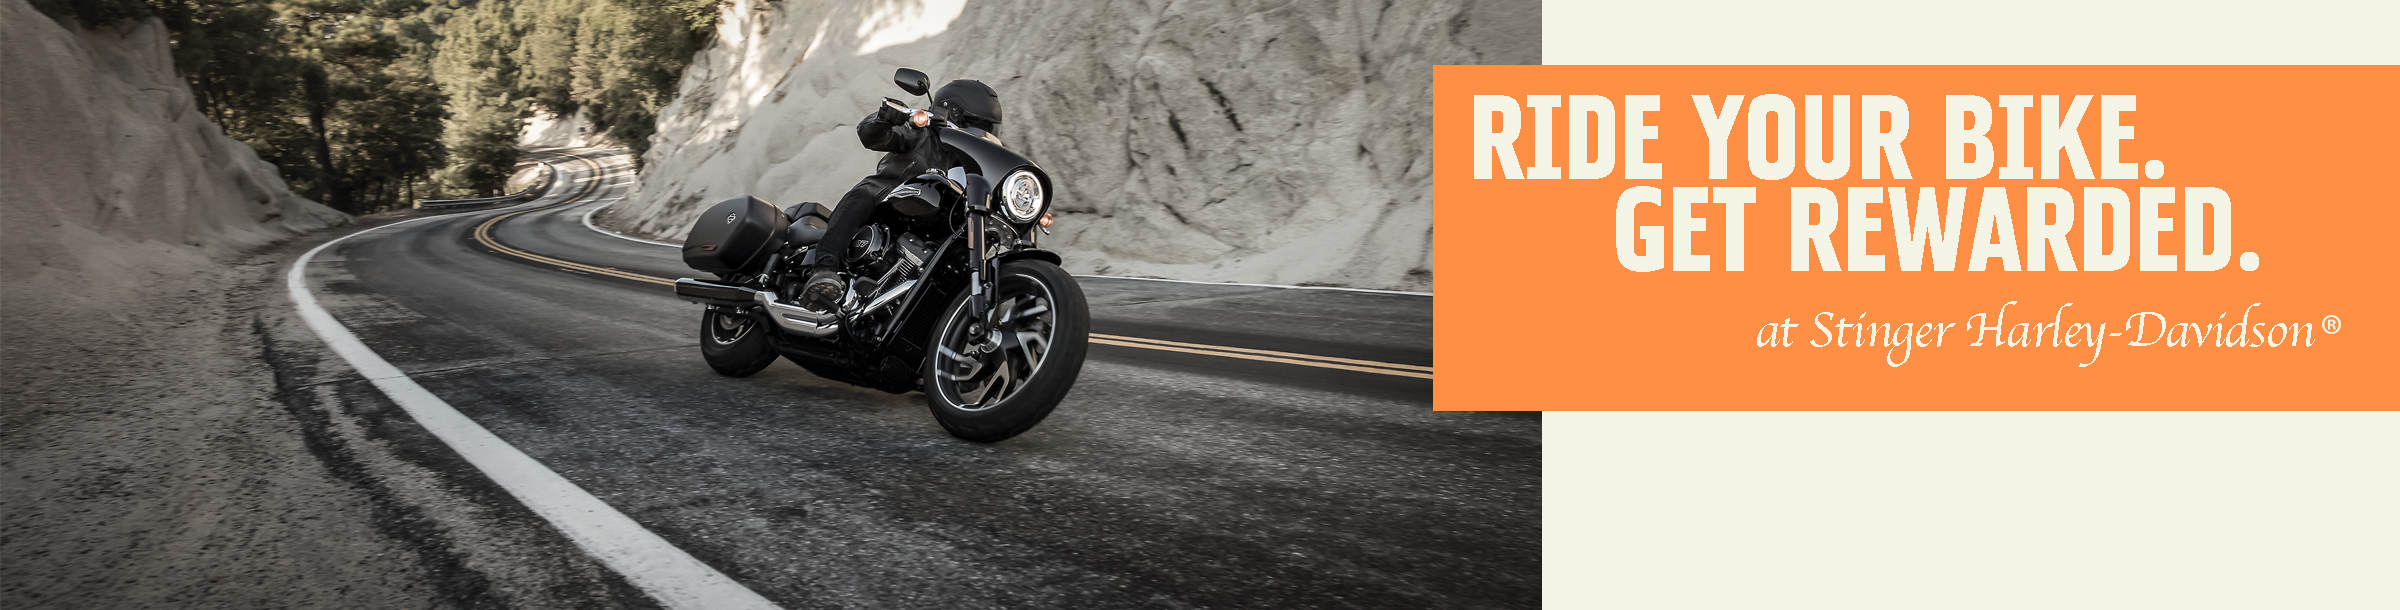 Rider Rewards Program